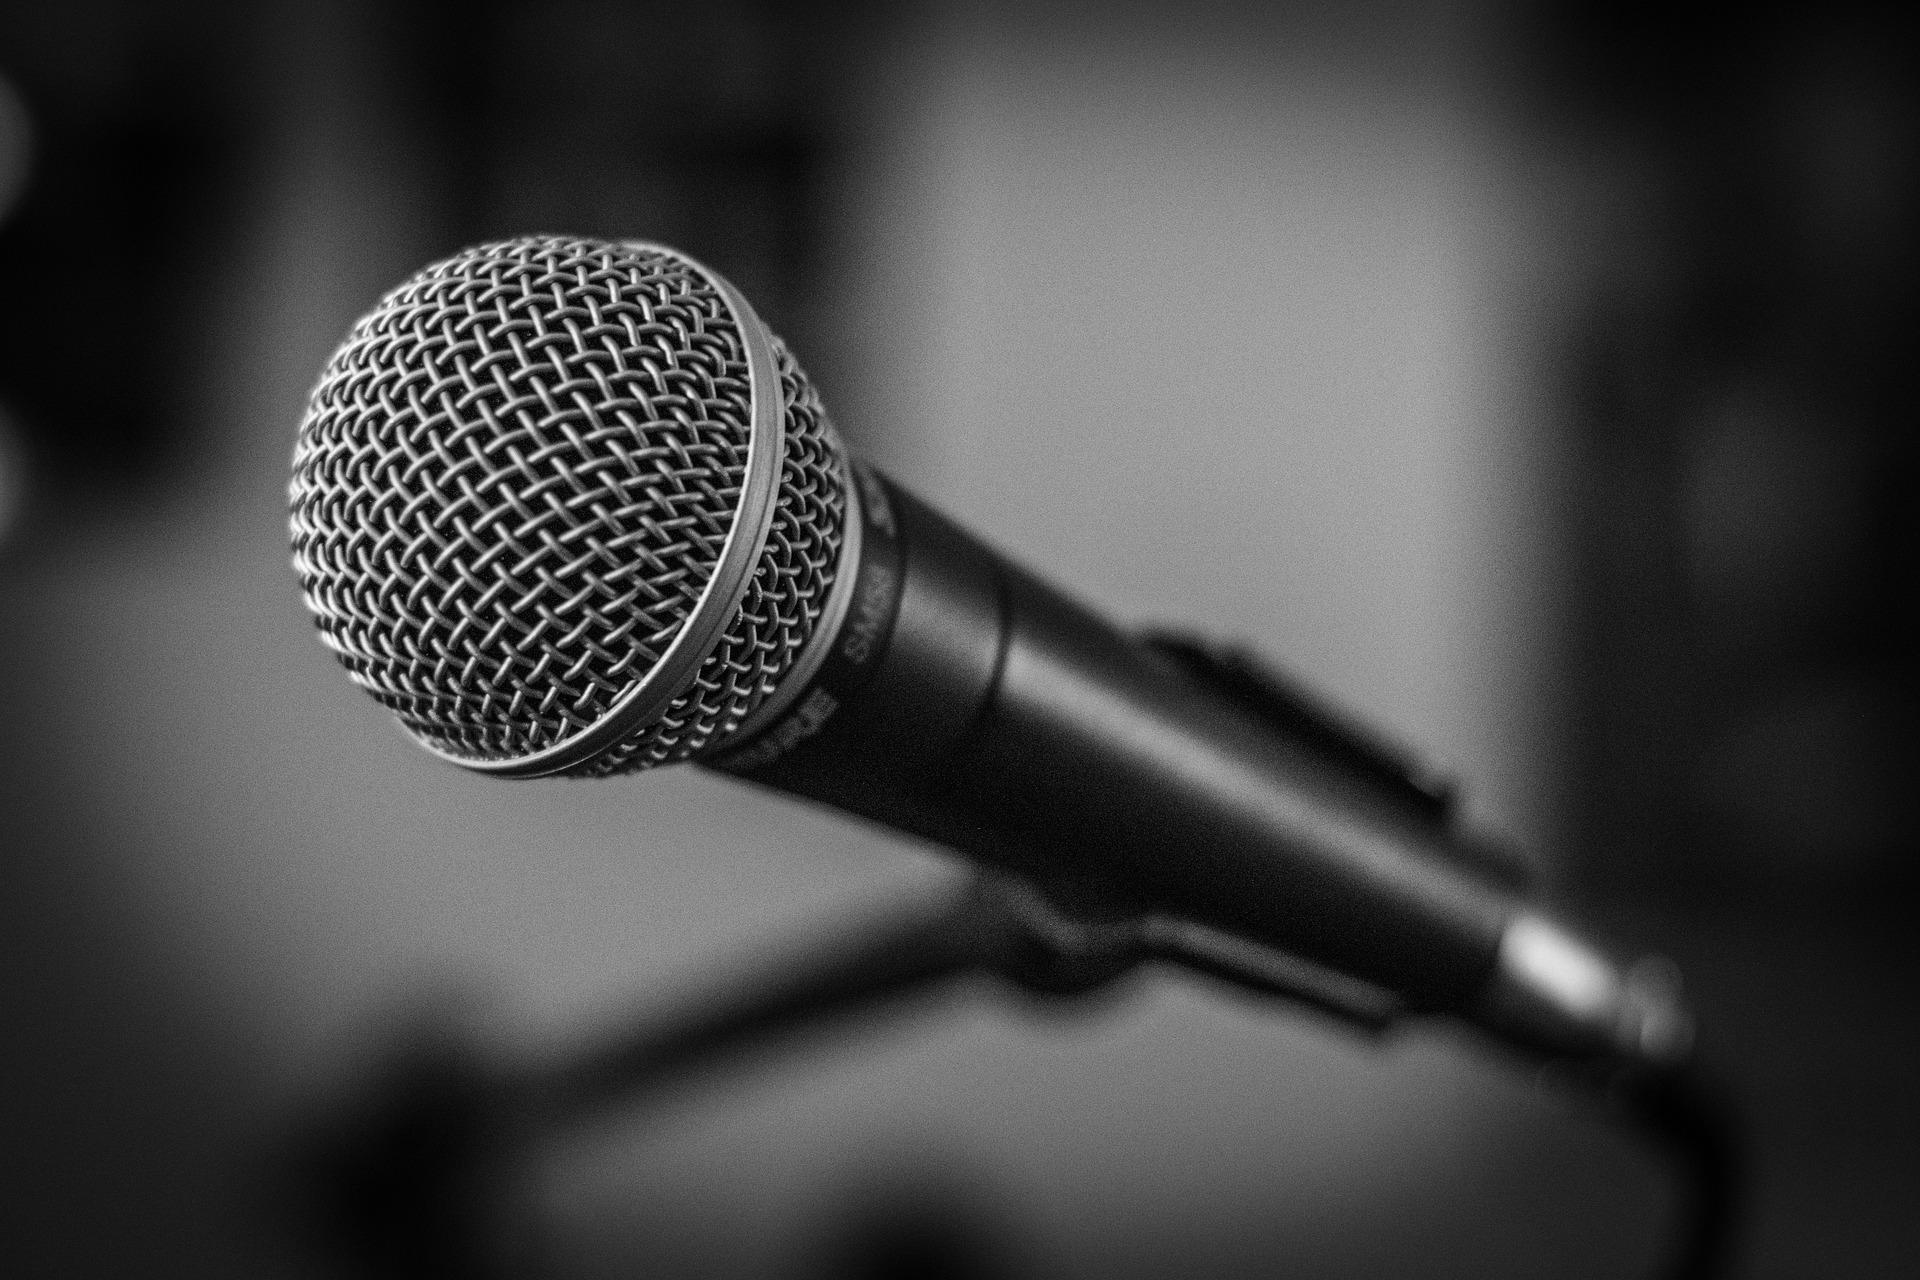 microphone-1505182_1920